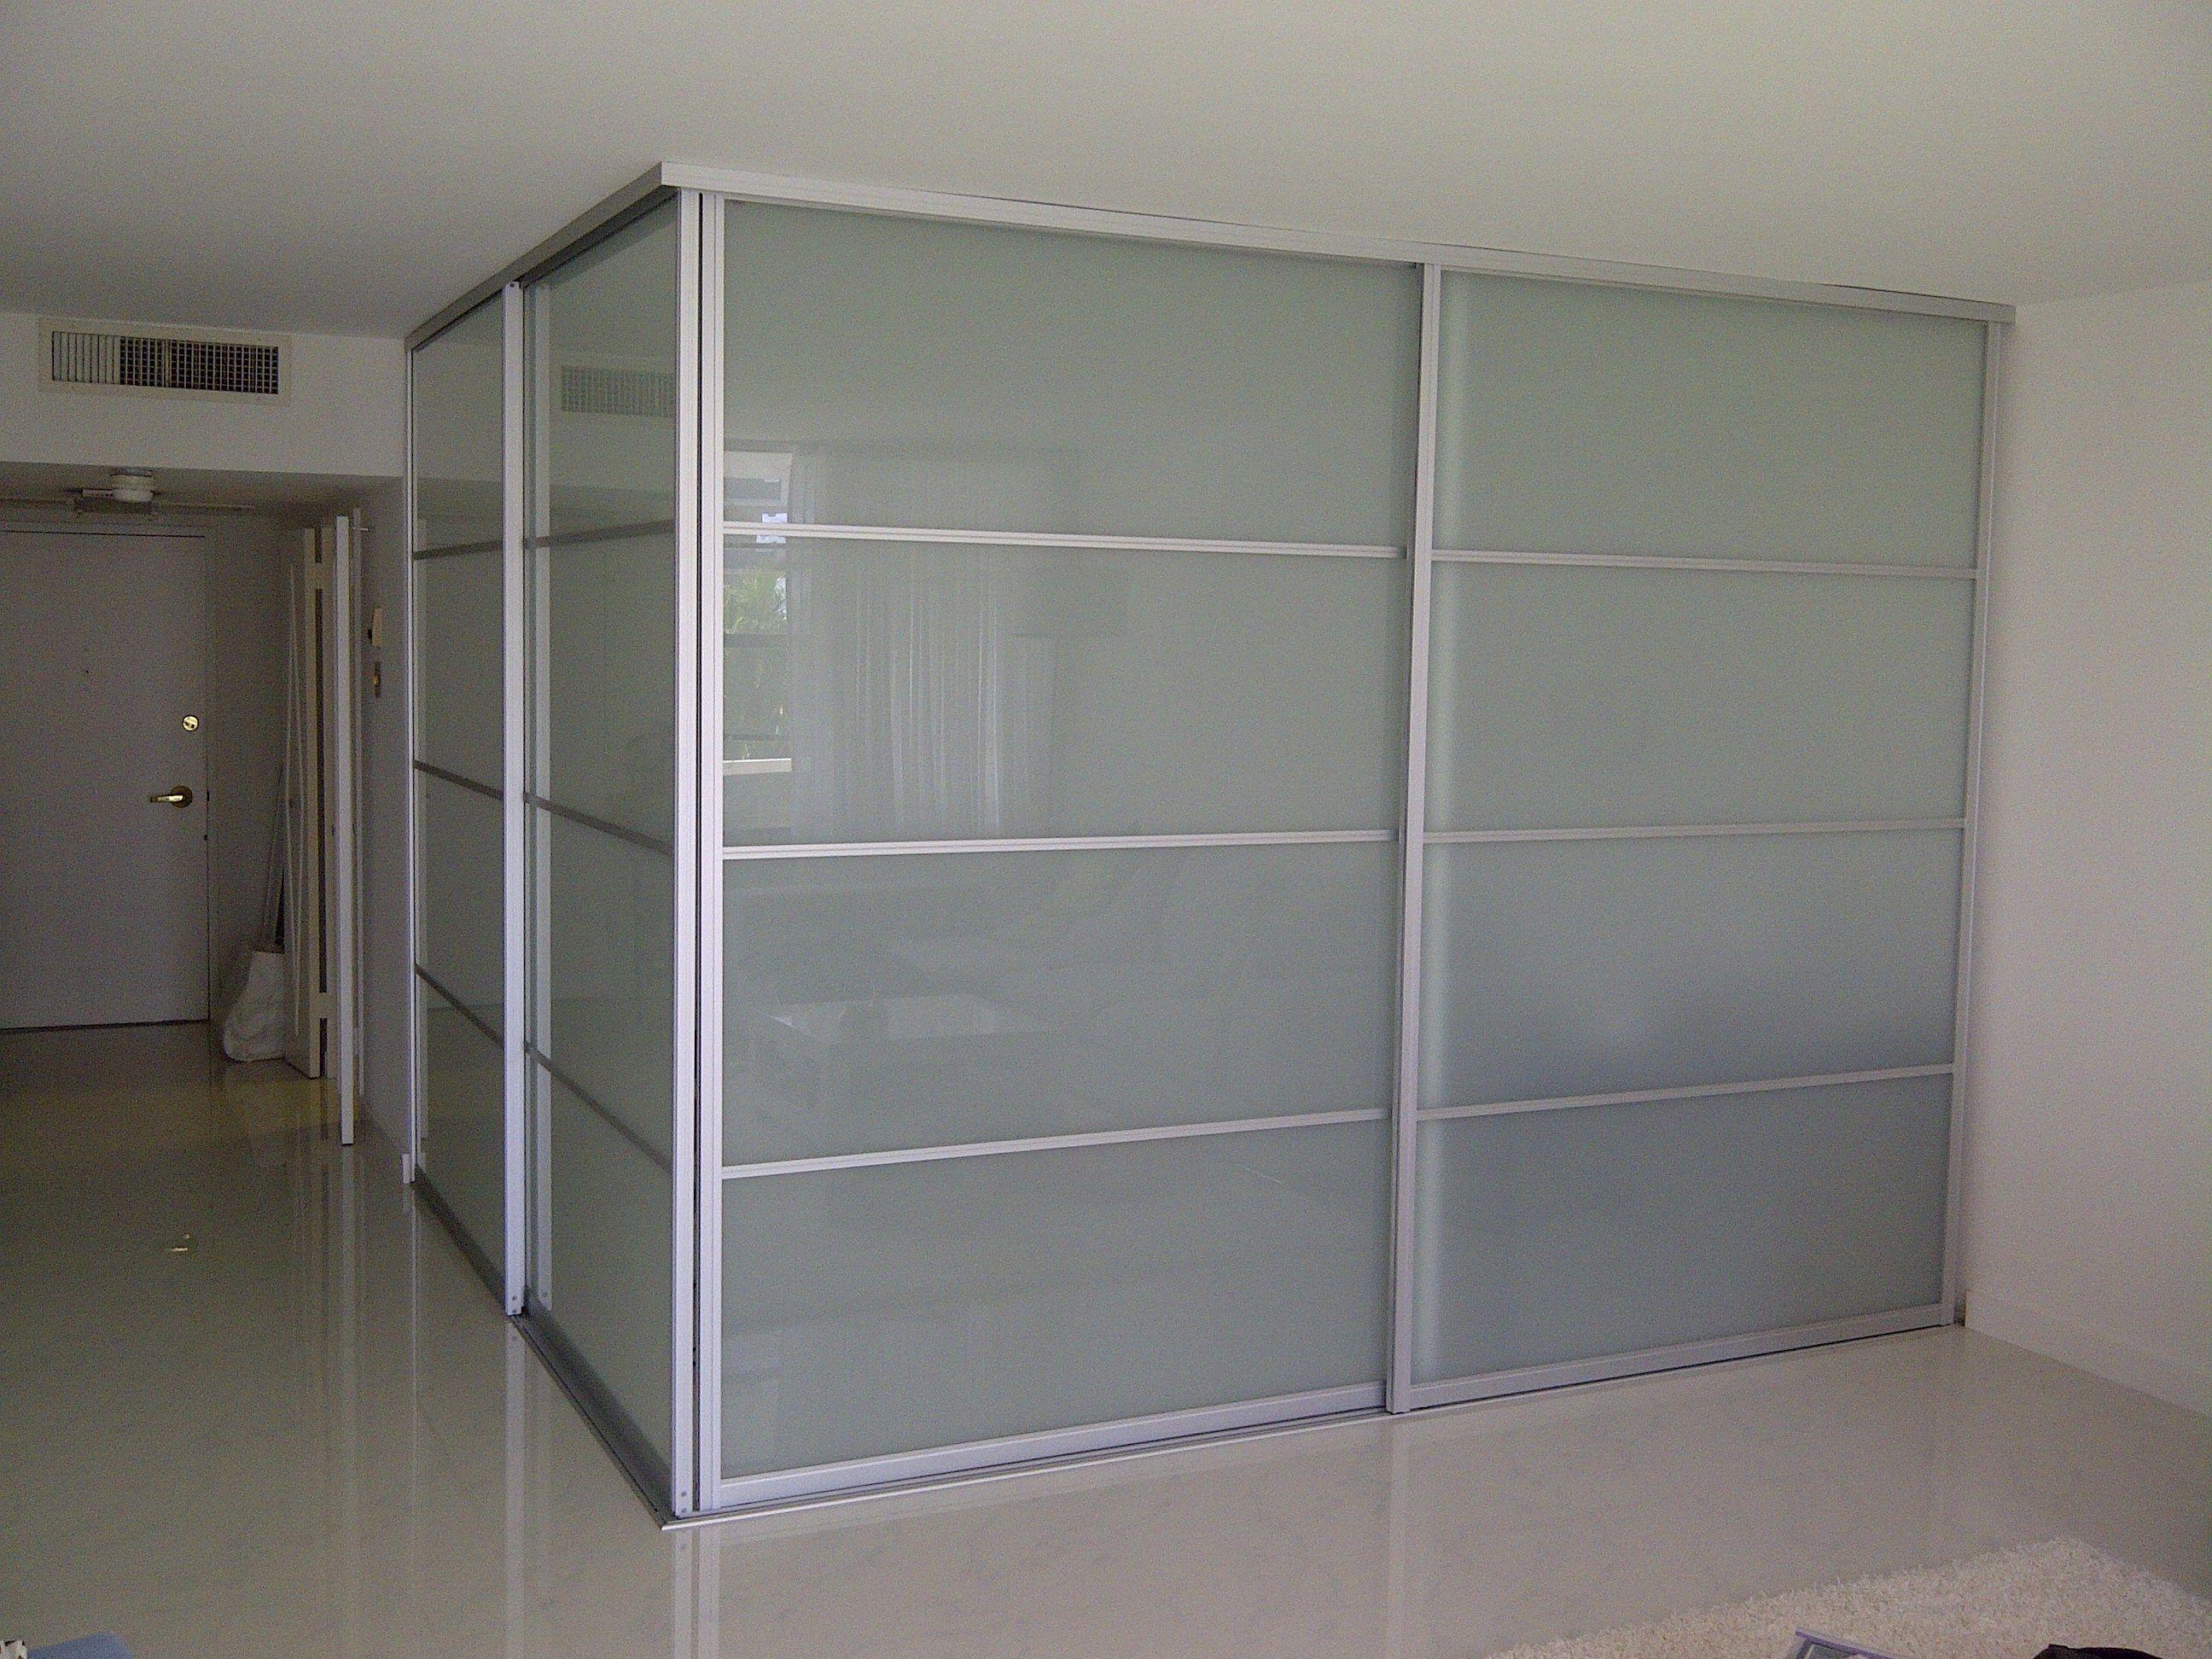 Practice Ikea Room Divider For Inspiring Room Design Ideas Cool Glass Panel Ikea Room Divider For Closet R Room Divider Bamboo Room Divider Metal Room Divider